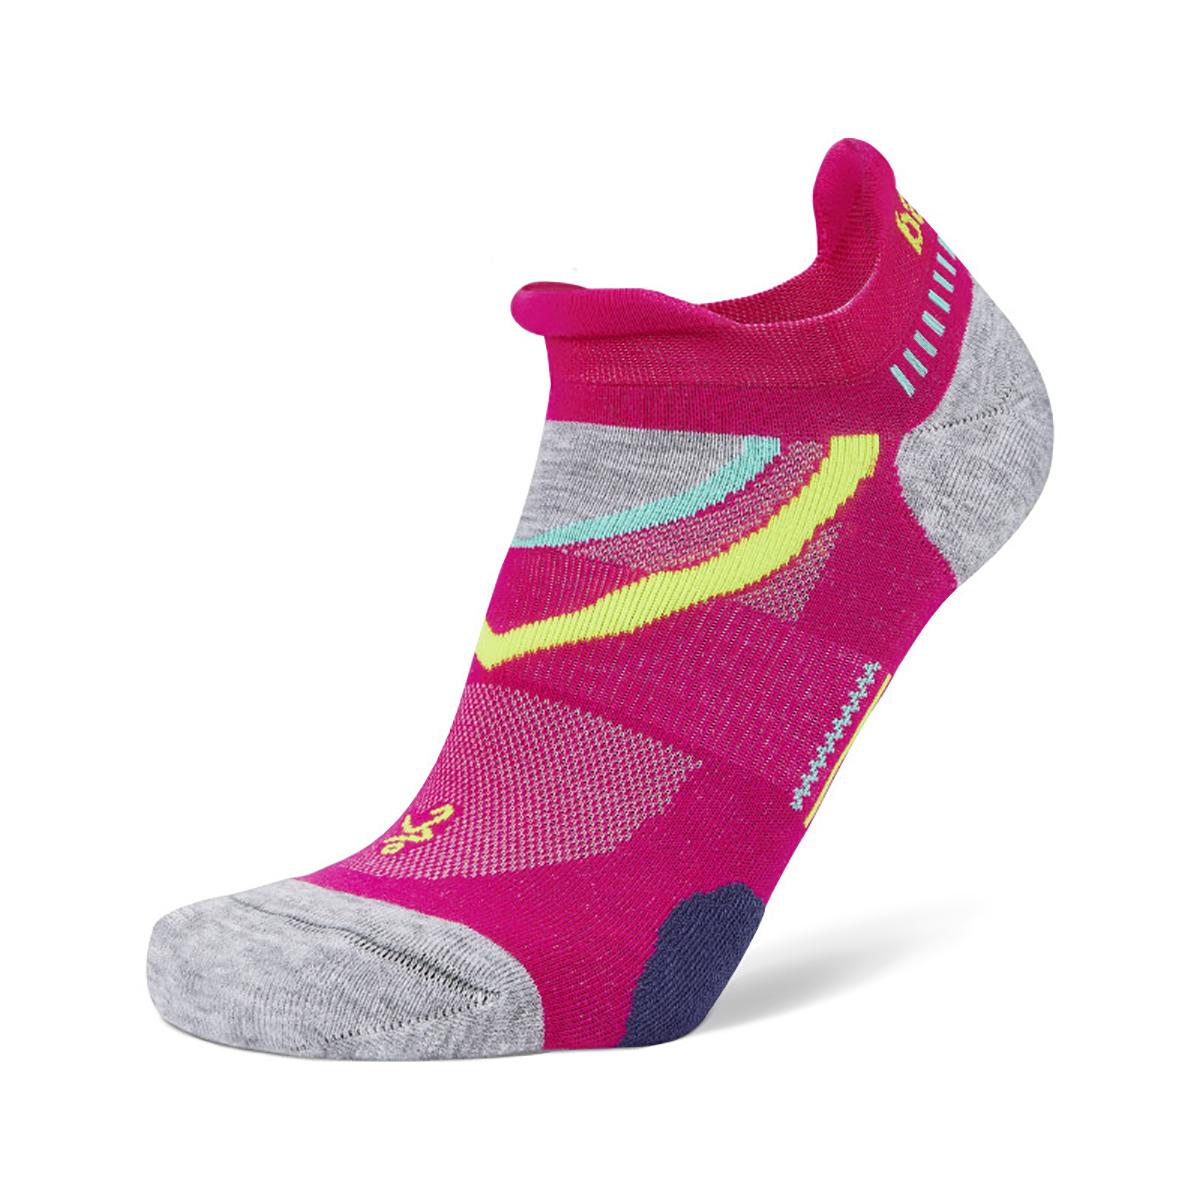 Balega UltraGlide Running Socks - Color: Electric Pink/ Midgrey - Size: S, Electric Pink/ Midgrey, large, image 1